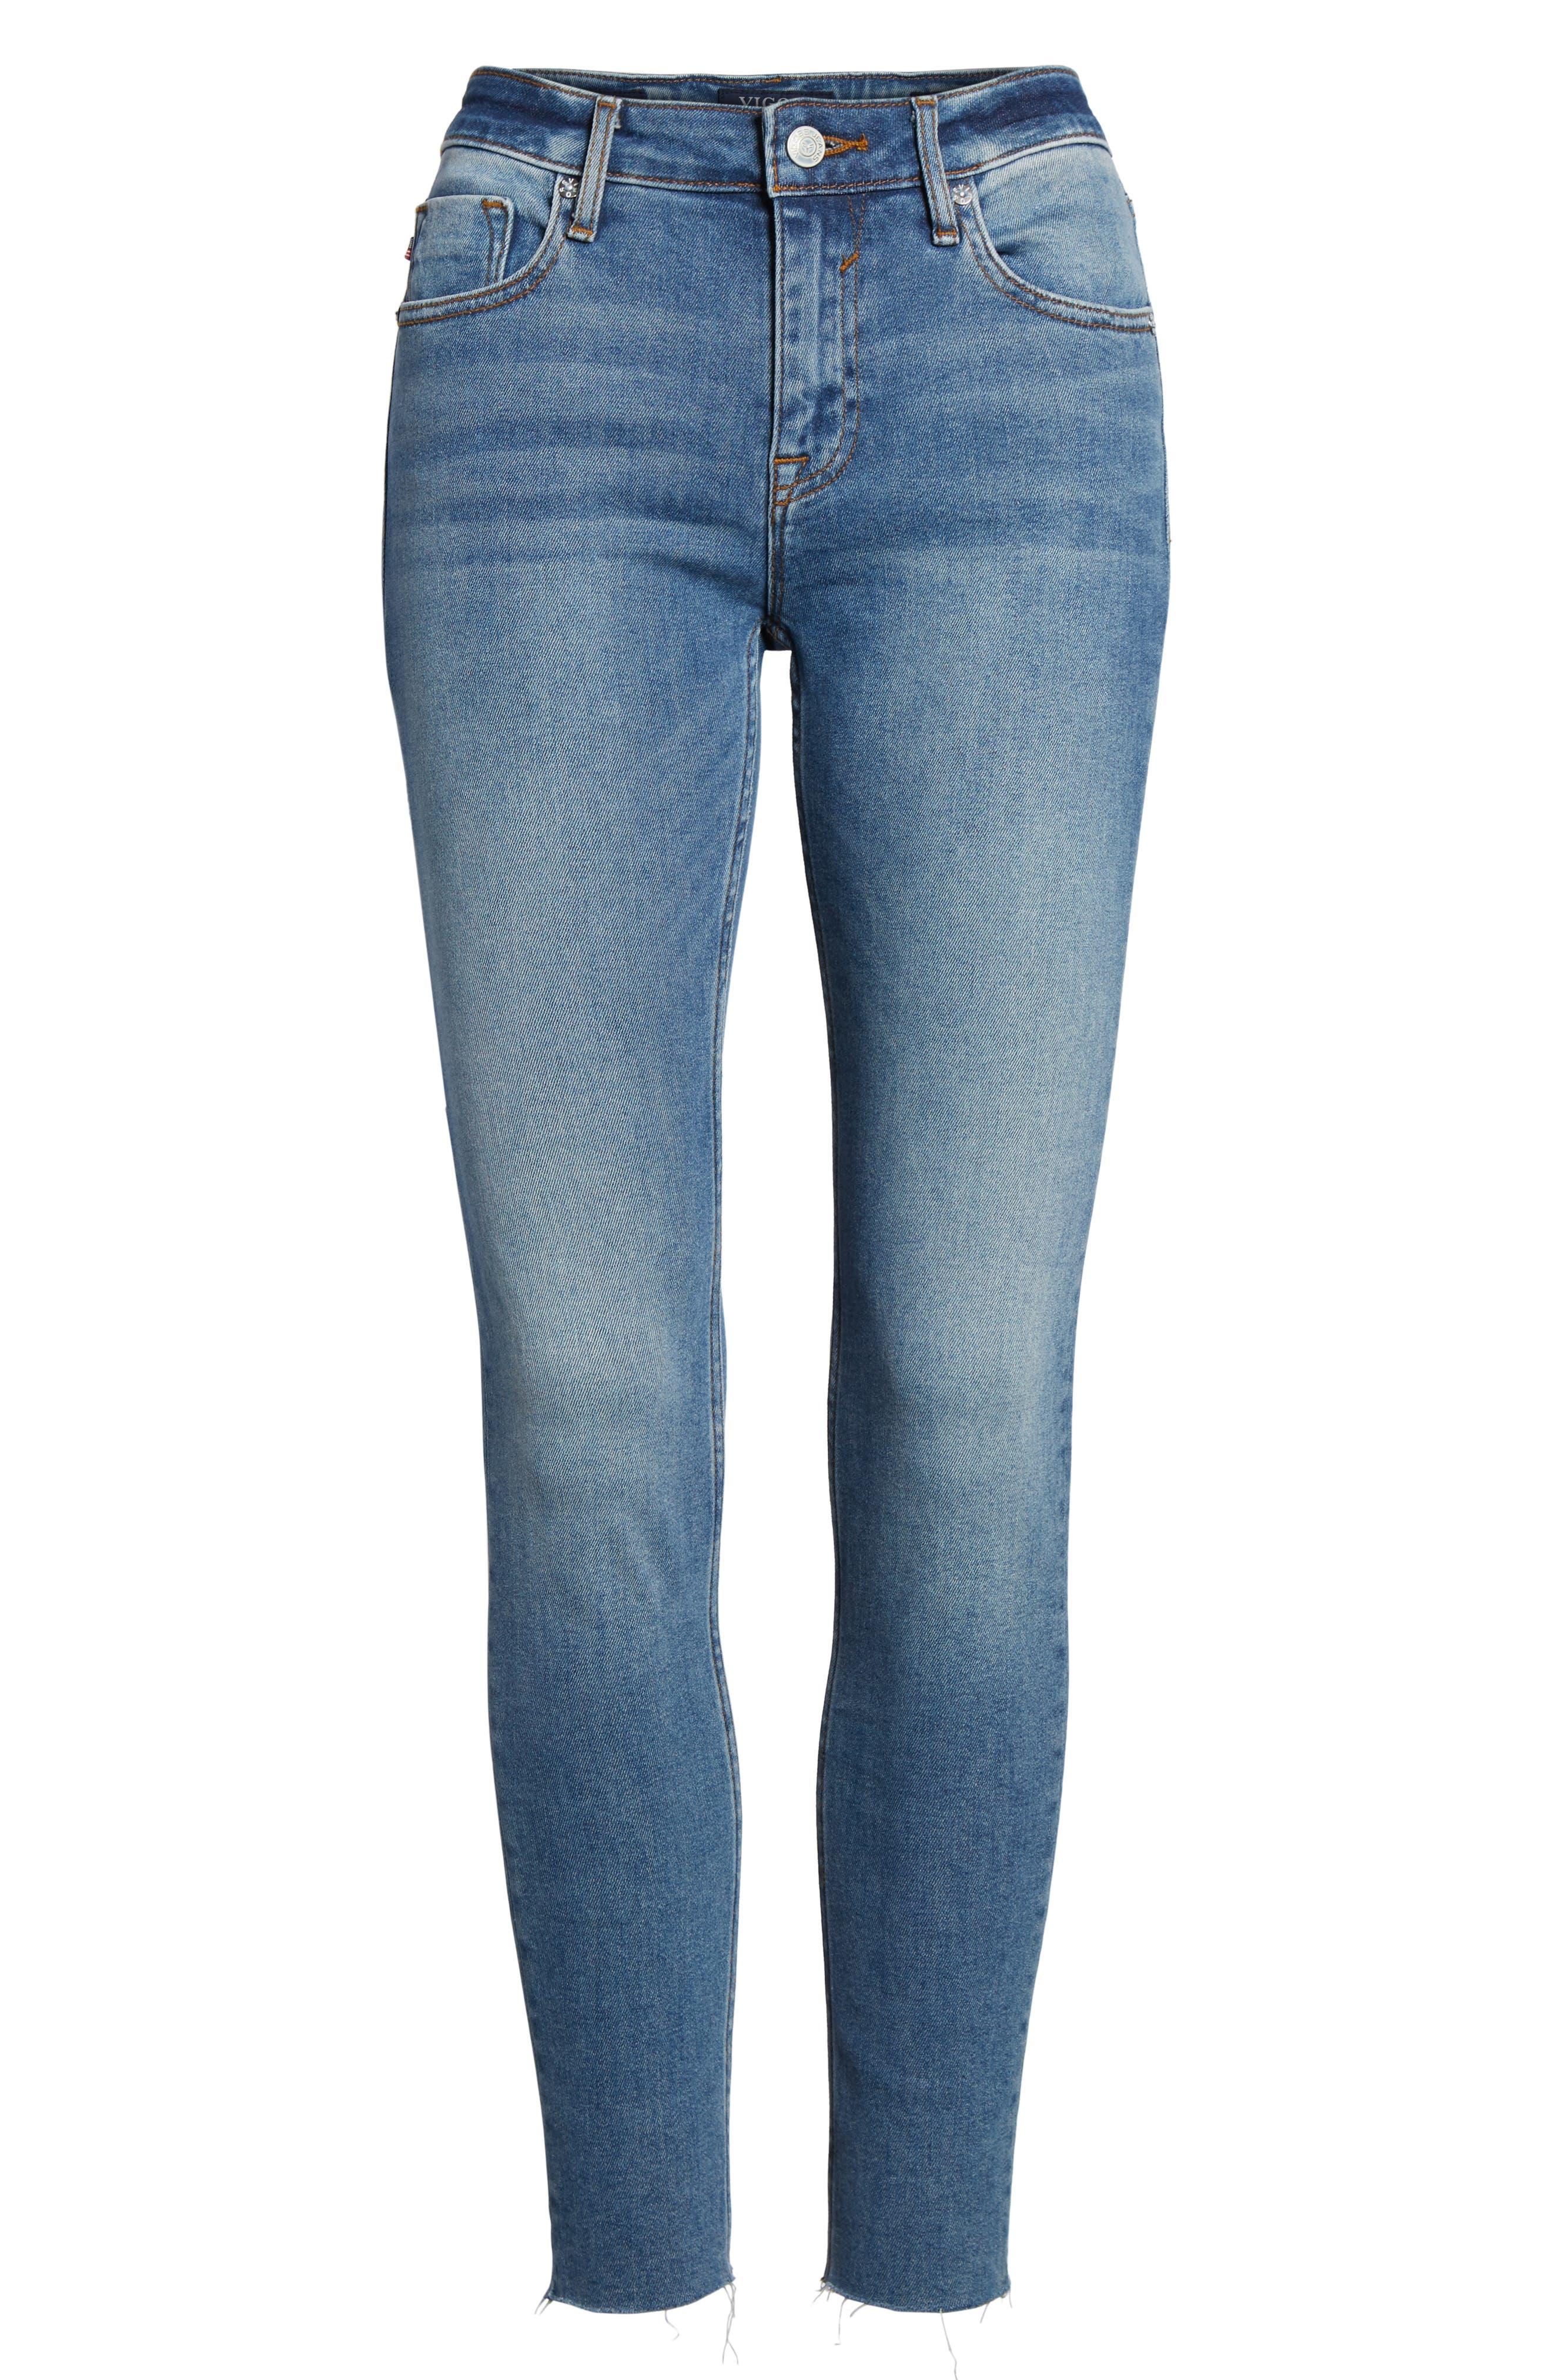 Marley Raw Hem Super Skinny Jeans,                             Alternate thumbnail 7, color,                             461